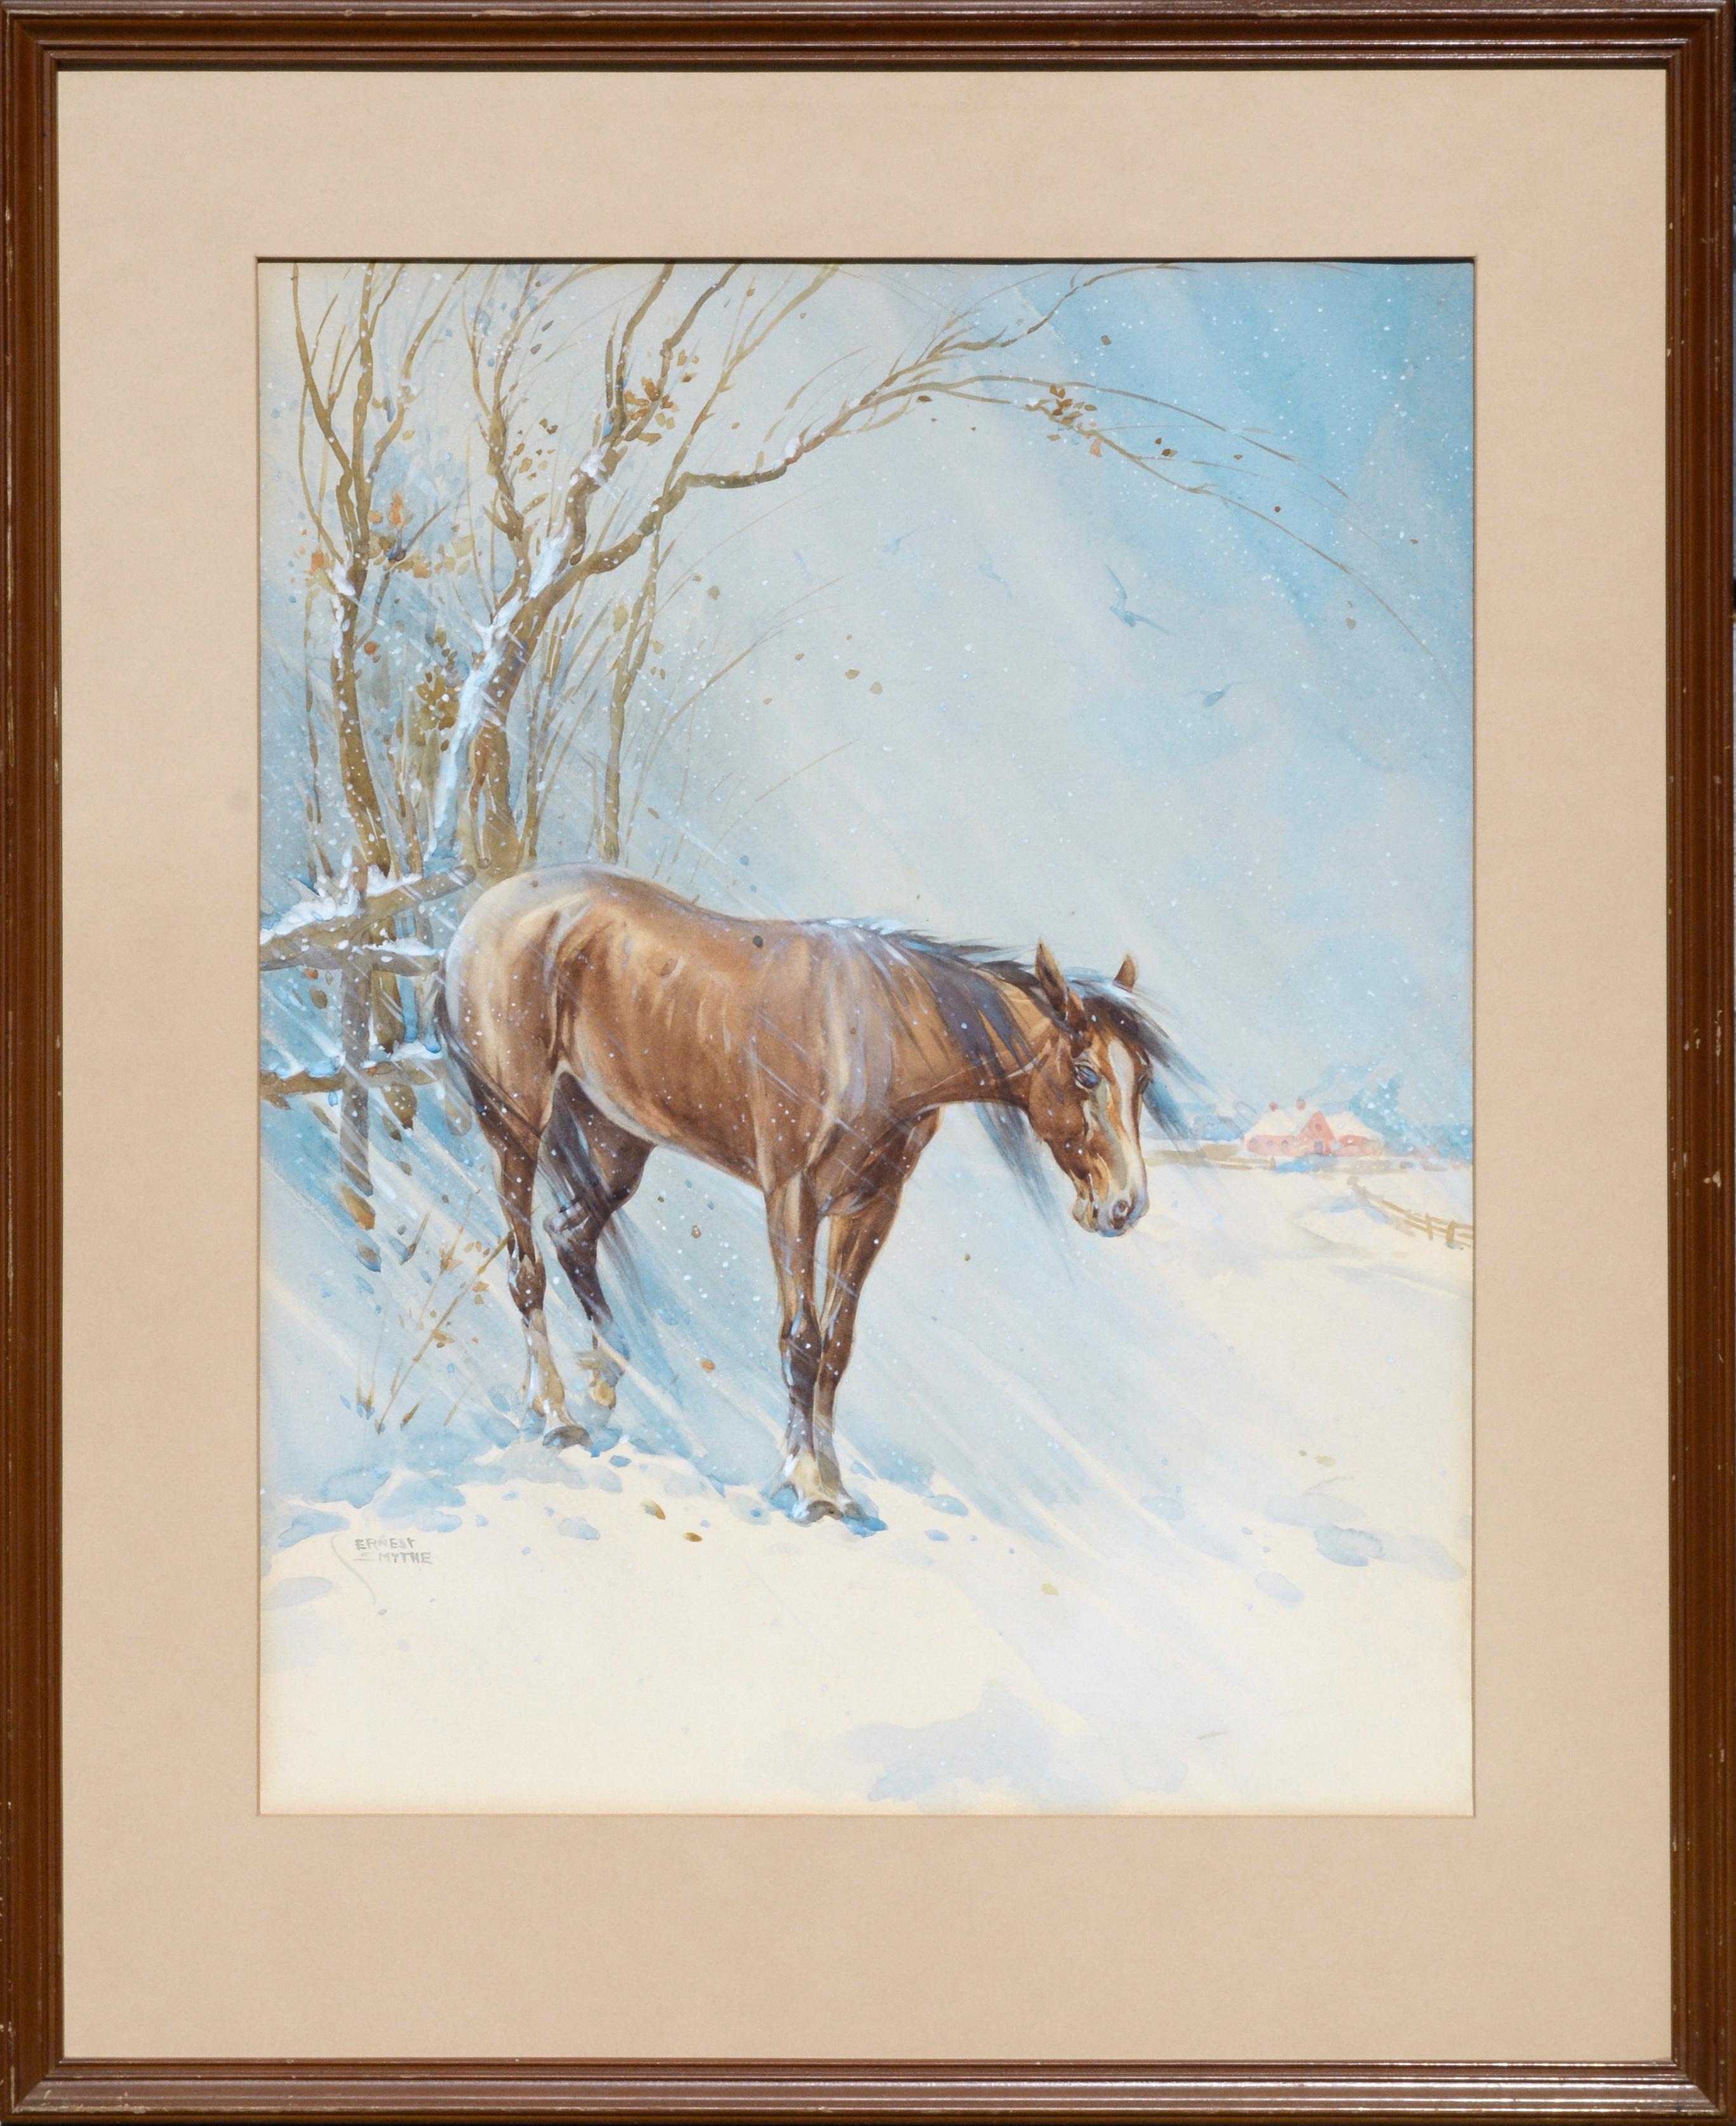 Mid Century Horse in Winter Landscape